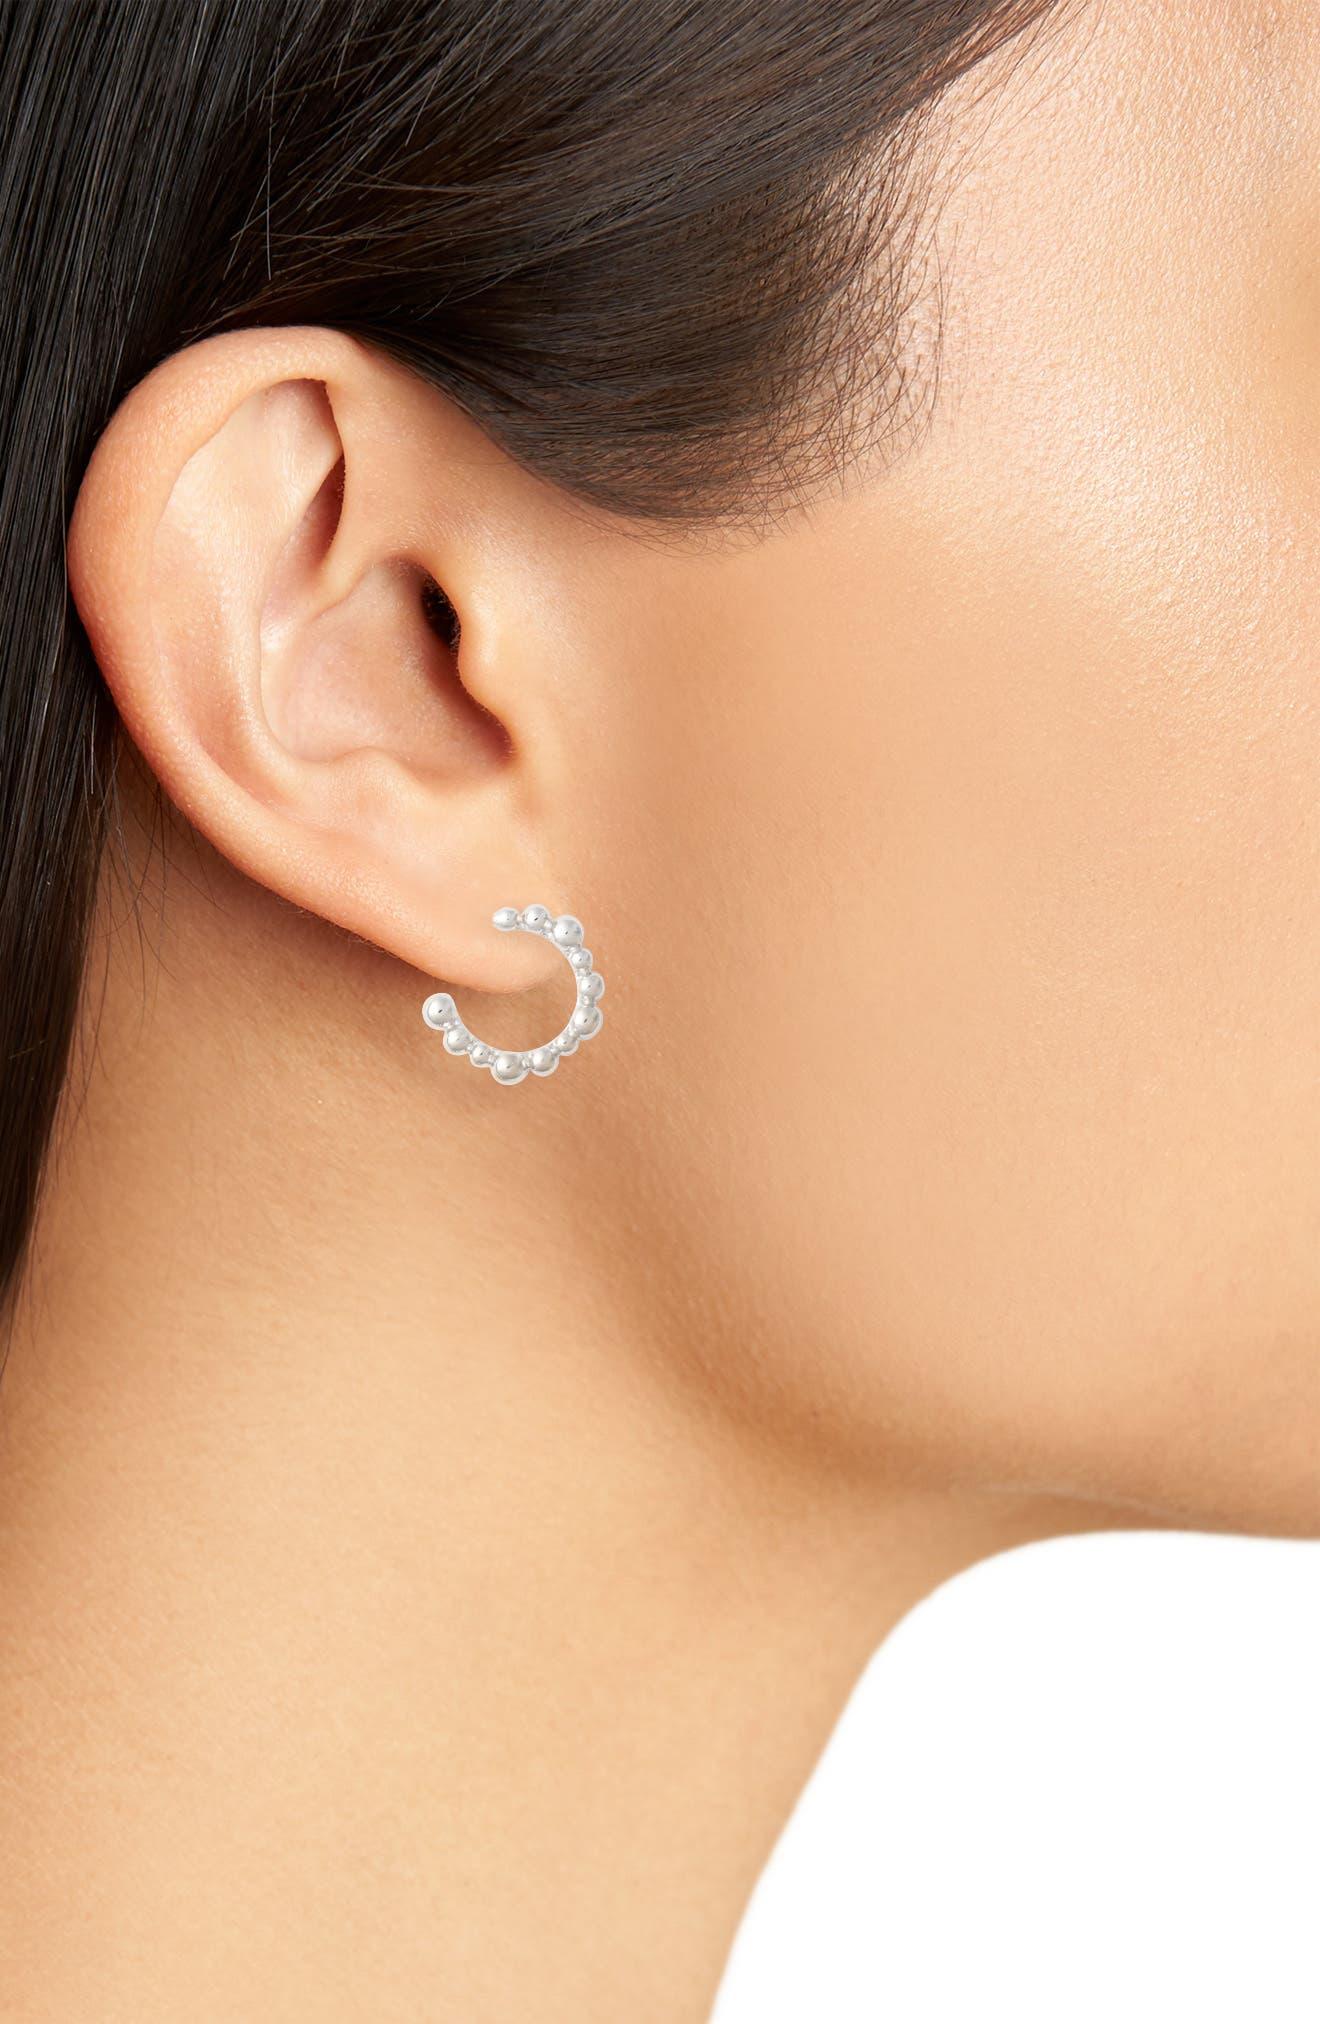 ANZIE, Bubbling Brook Hoop Earrings, Alternate thumbnail 2, color, SILVER